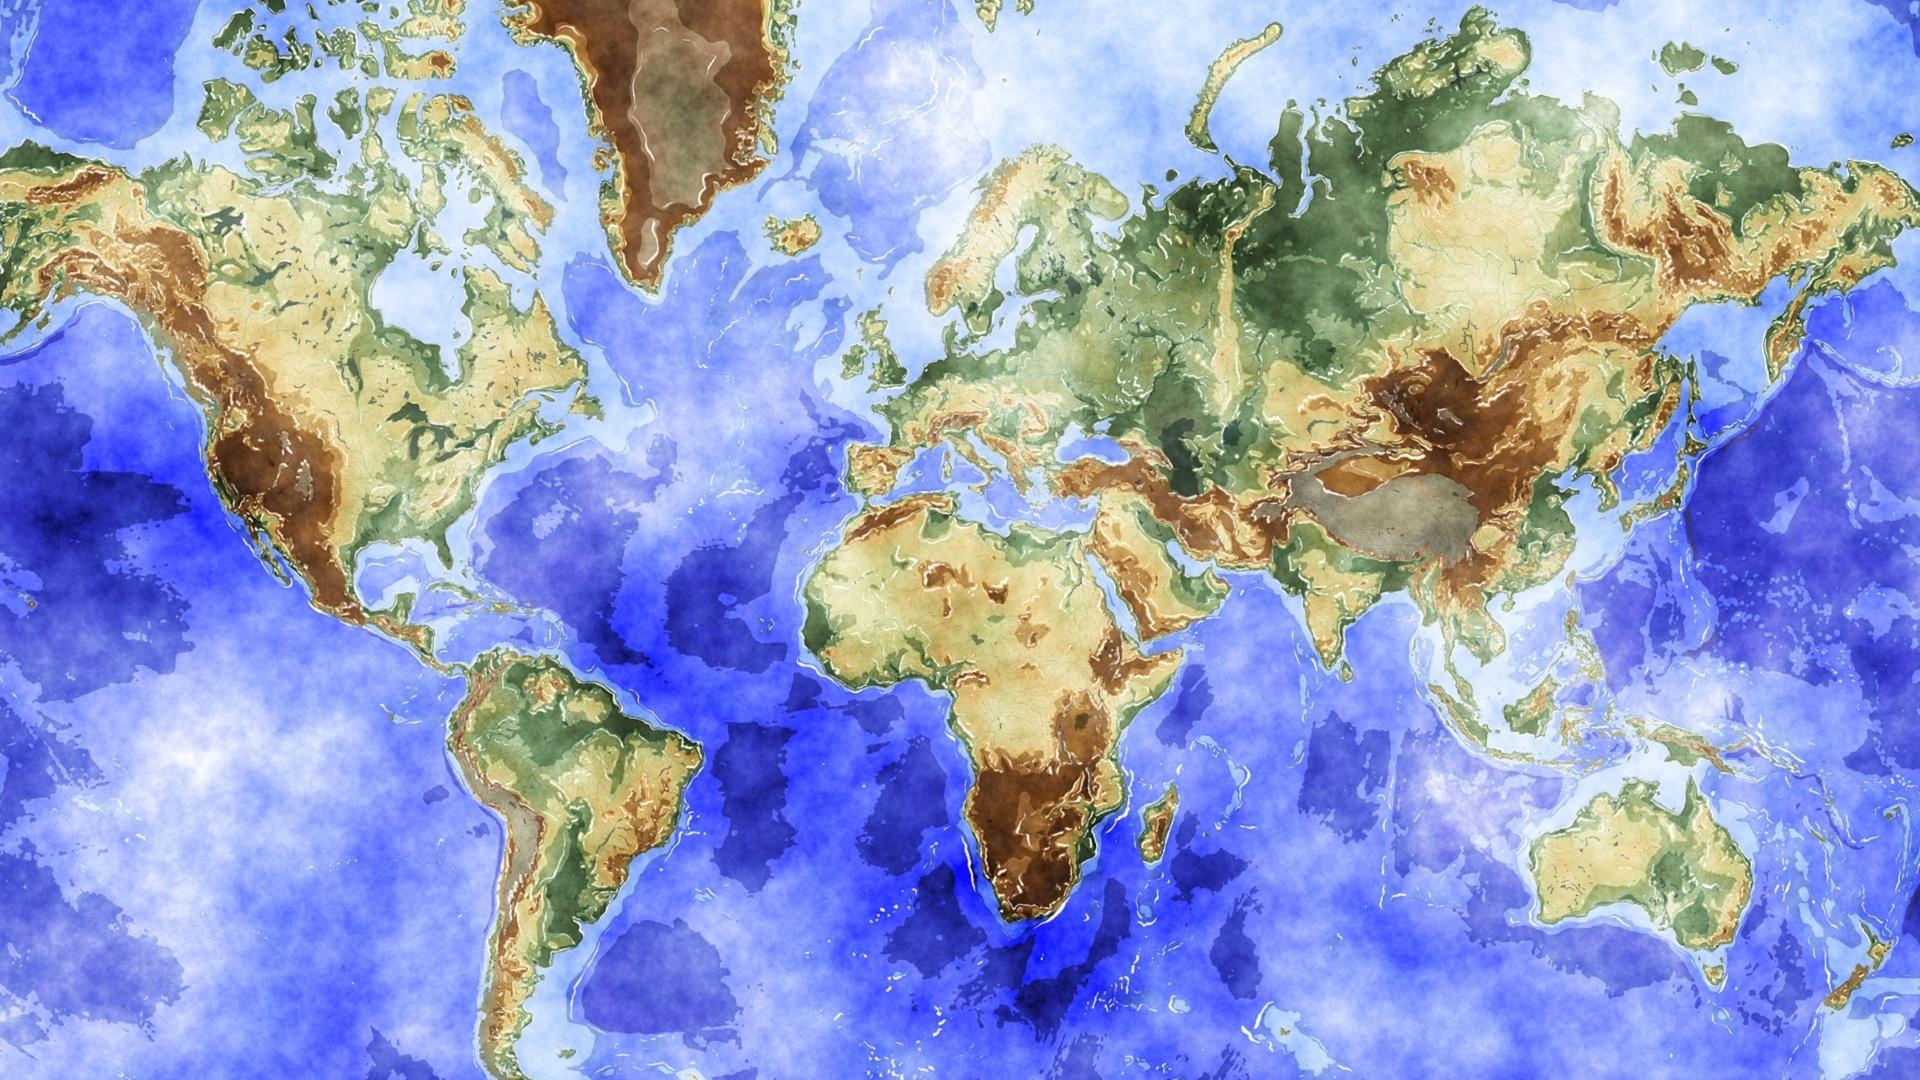 1920x1080 1920x1080 Maps, Watercolour, World Map, Watercolour World Map